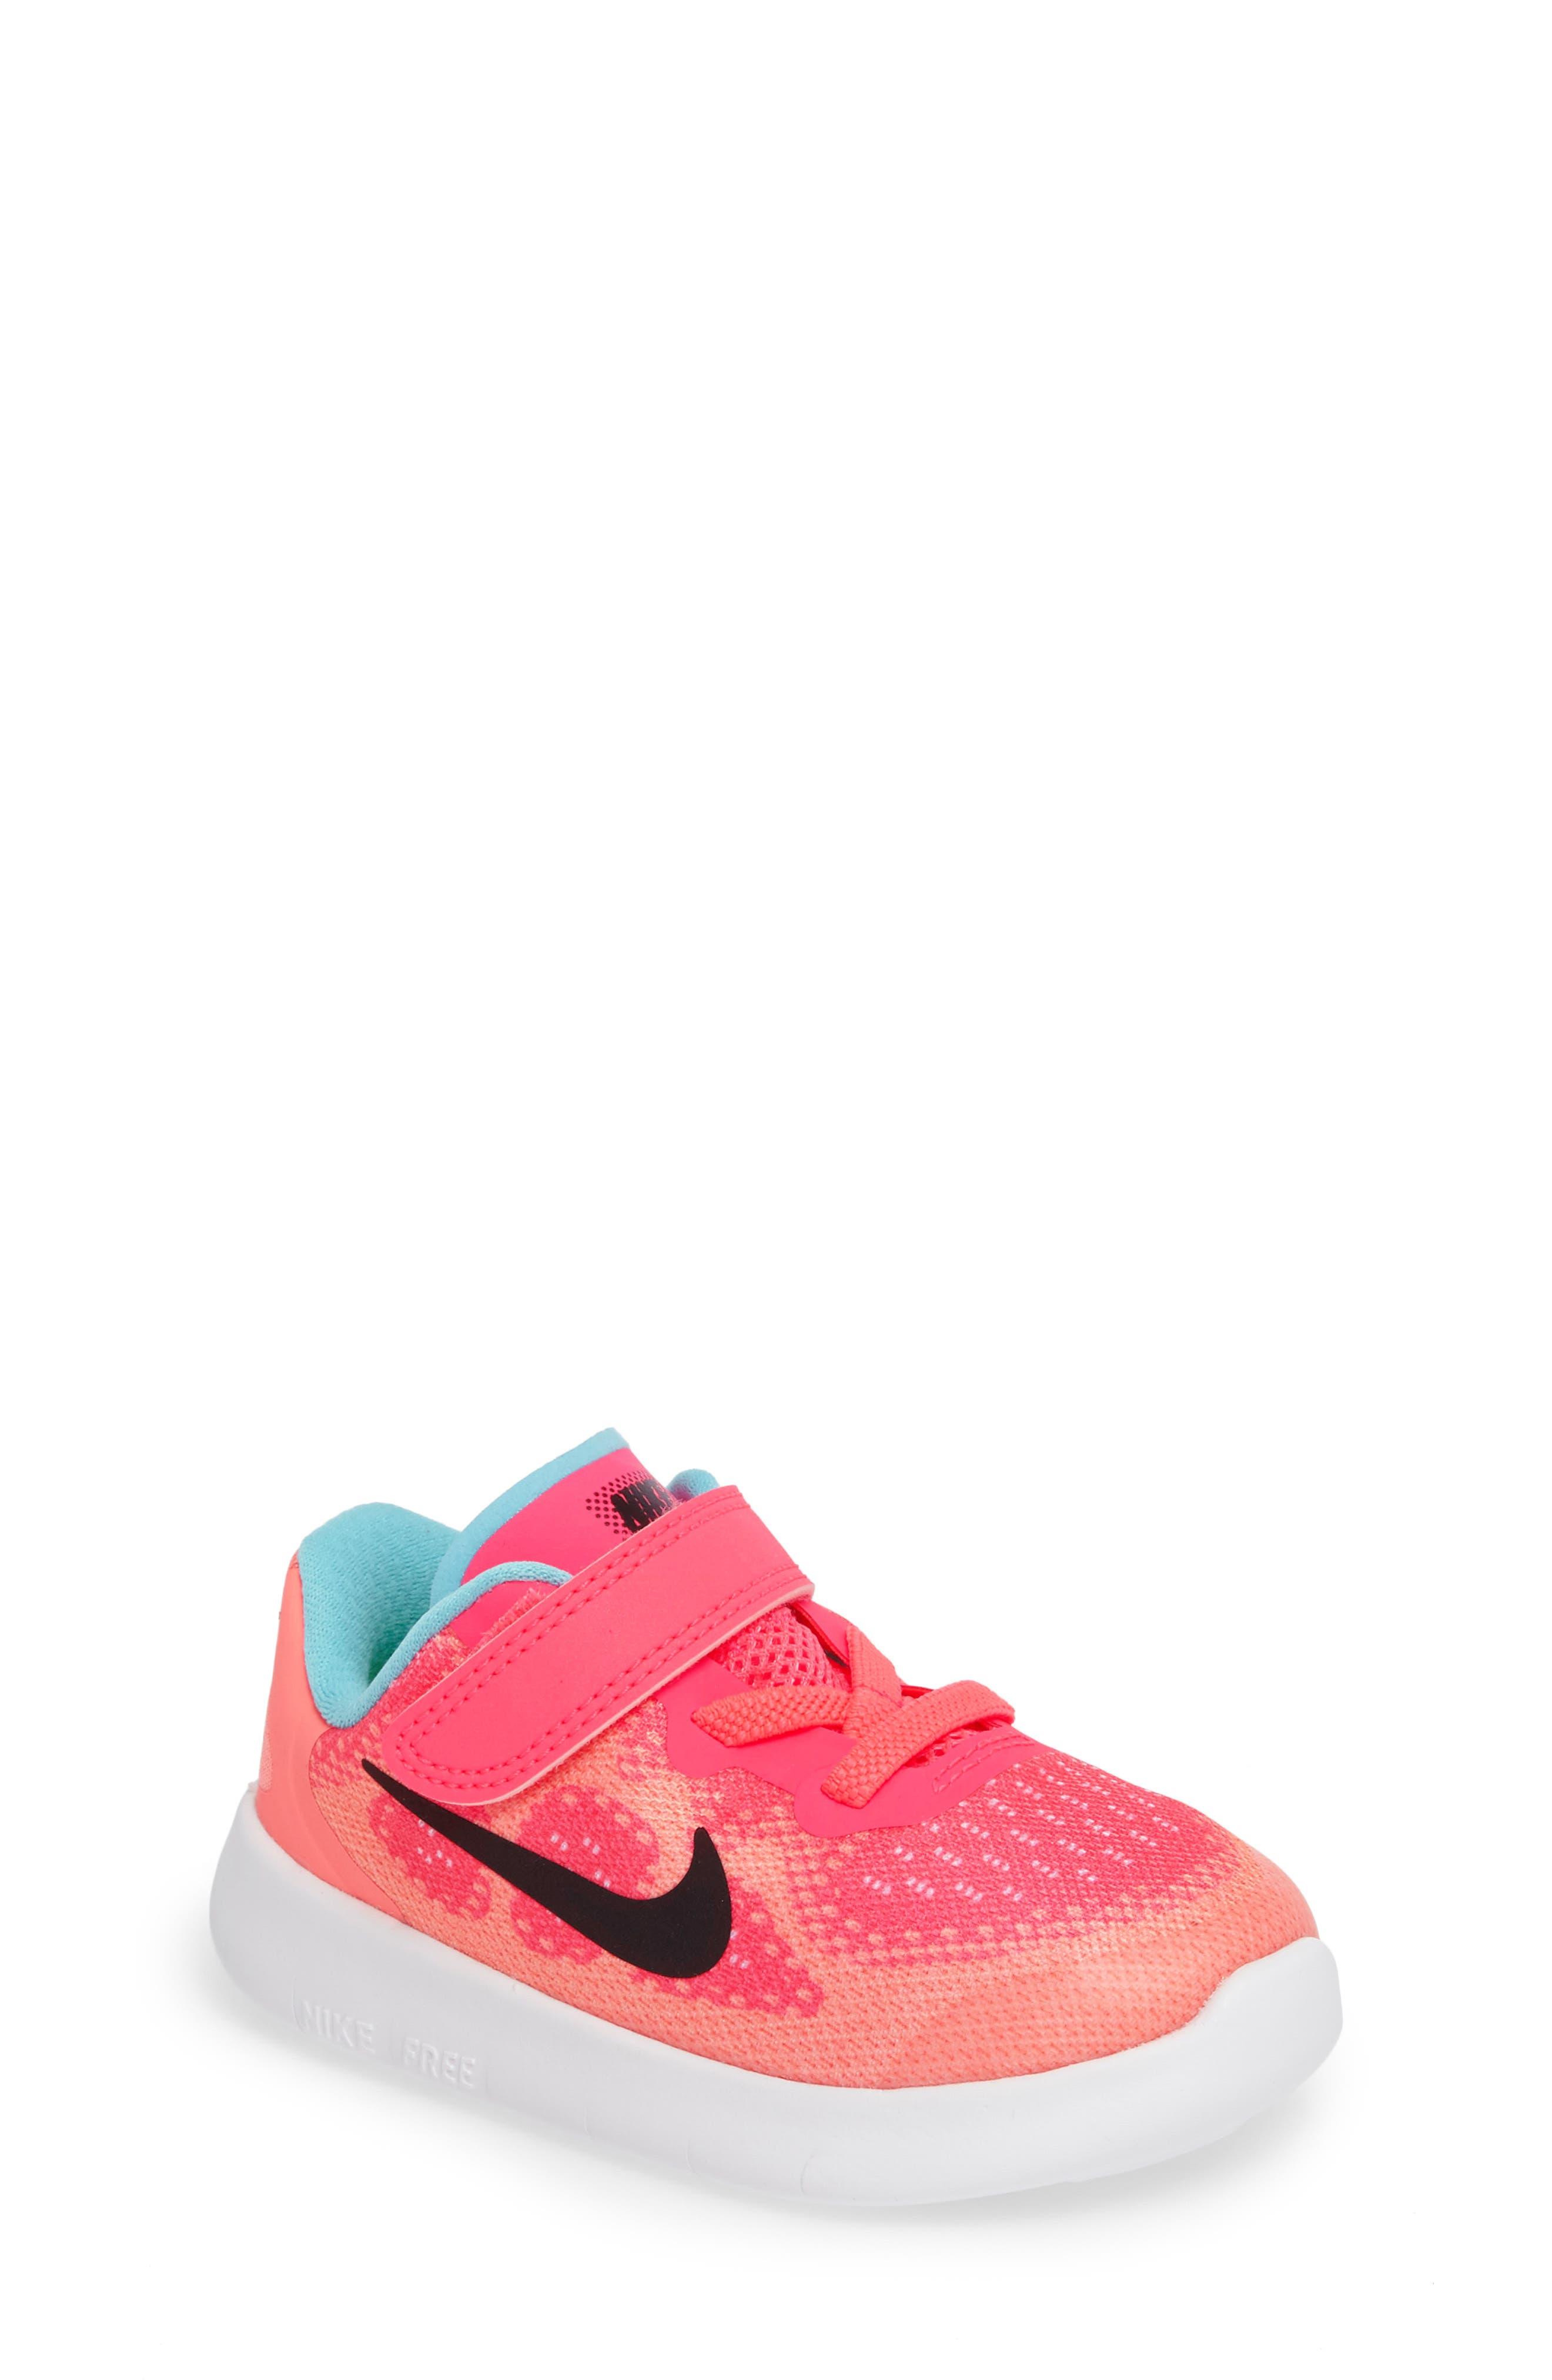 Alternate Image 1 Selected - Nike Free Run 2017 Sneaker (Baby, Walker, Toddler & Little Kid)